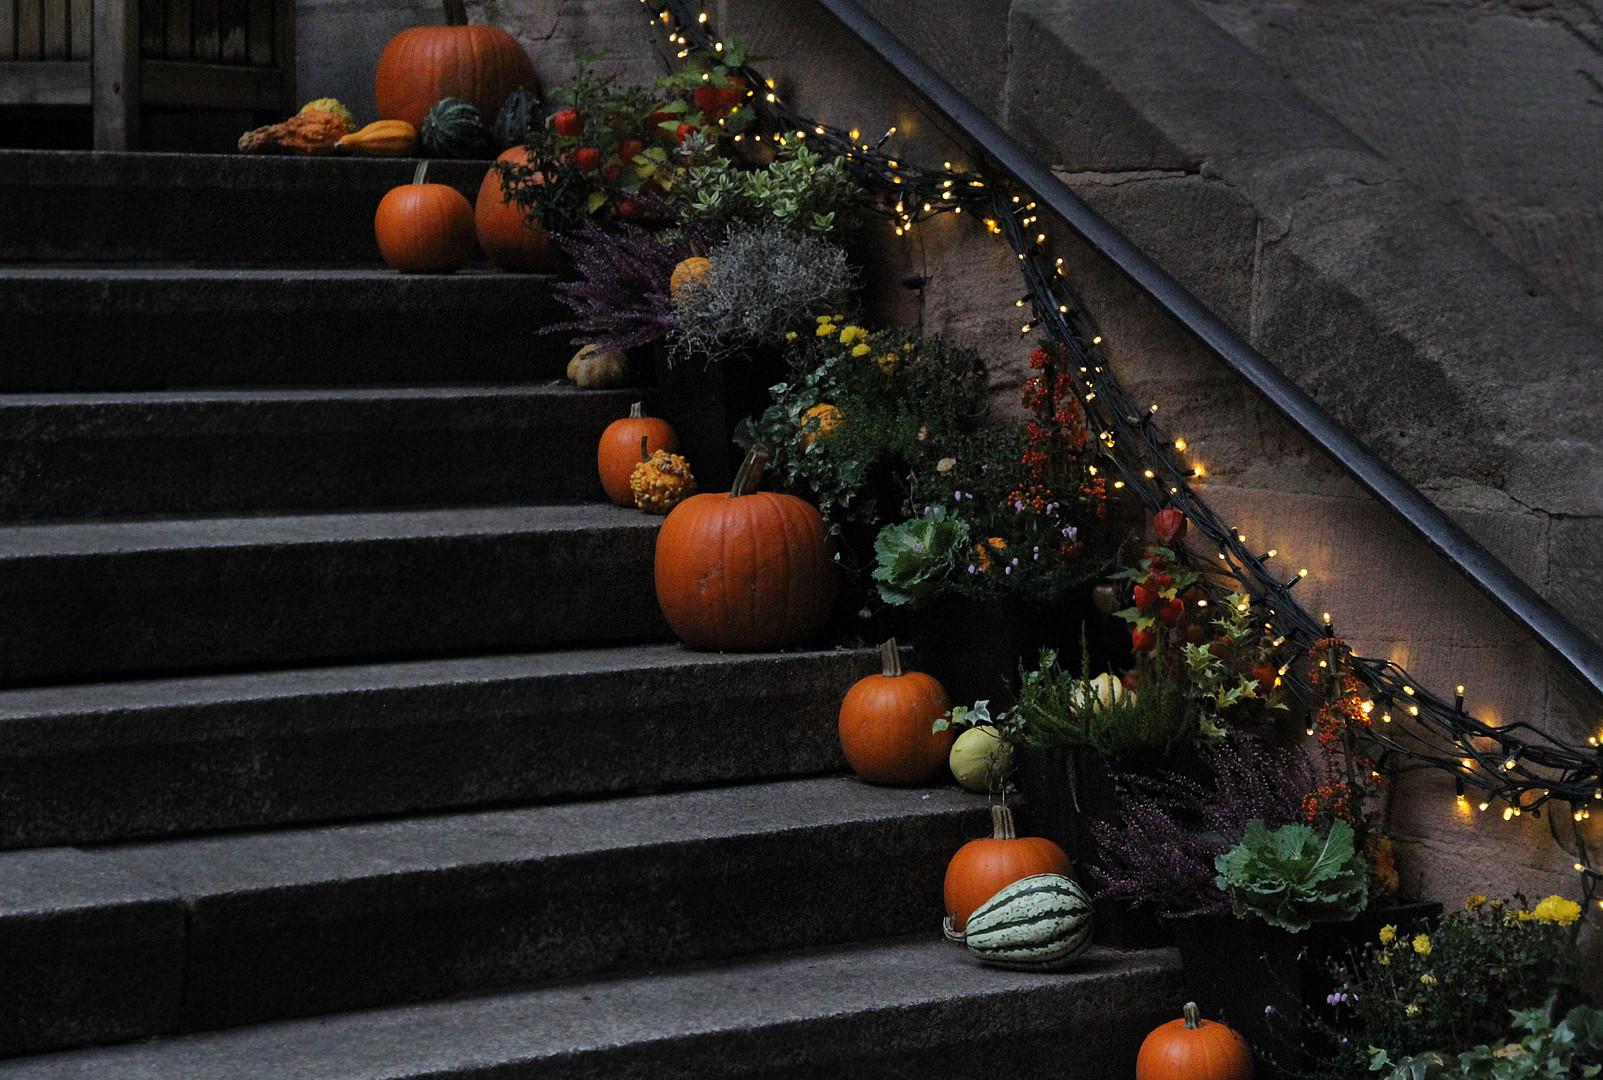 Herbst im Hinterhof.......................